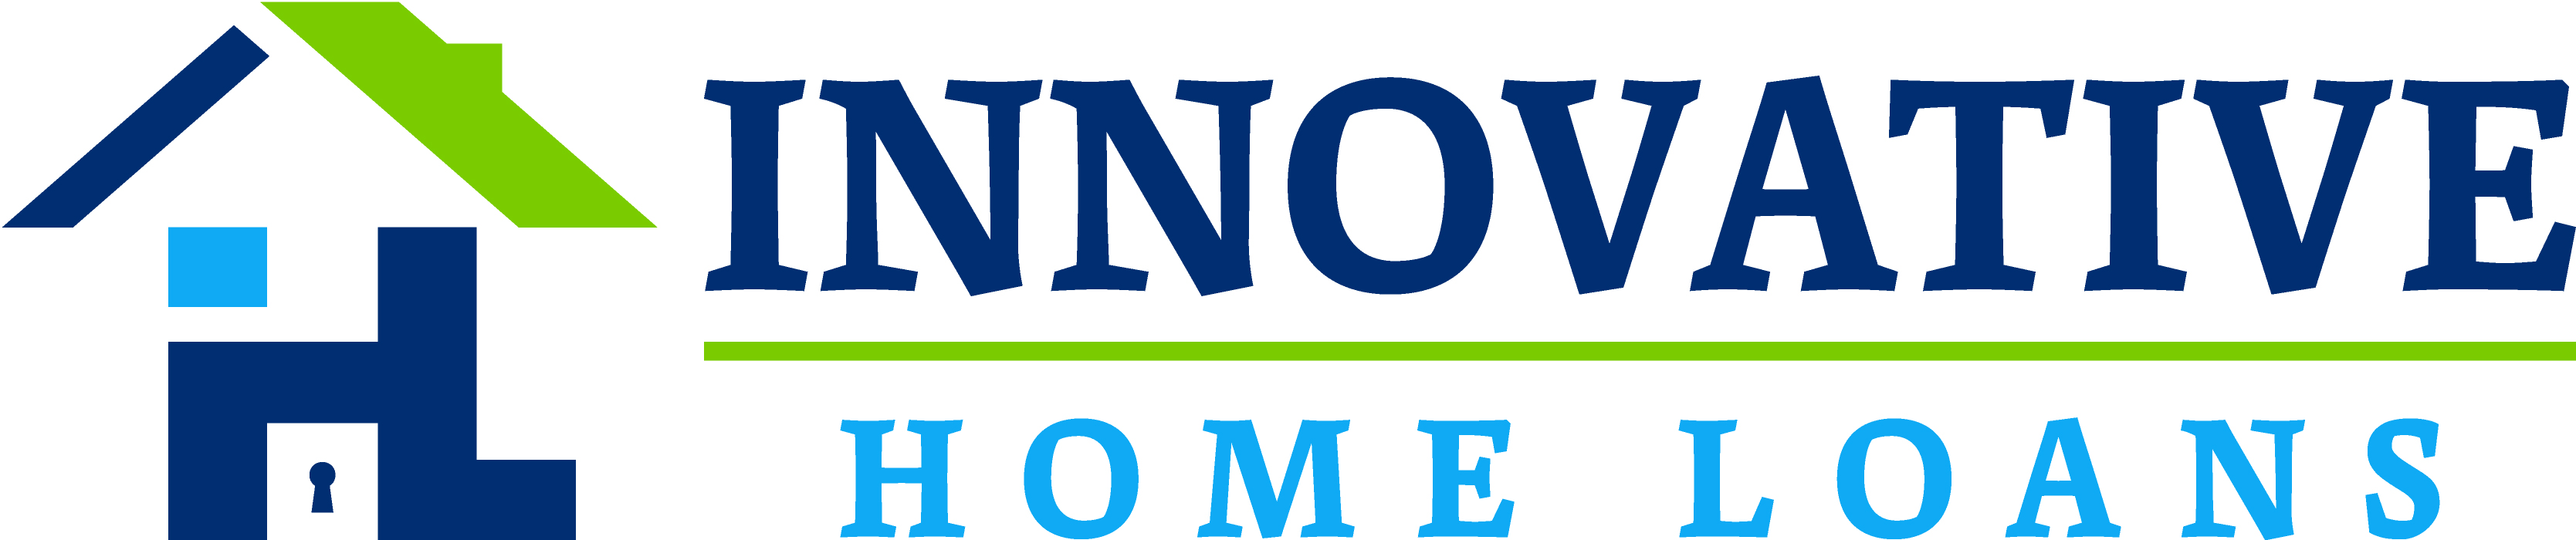 Innovative Home Loans LLC logo